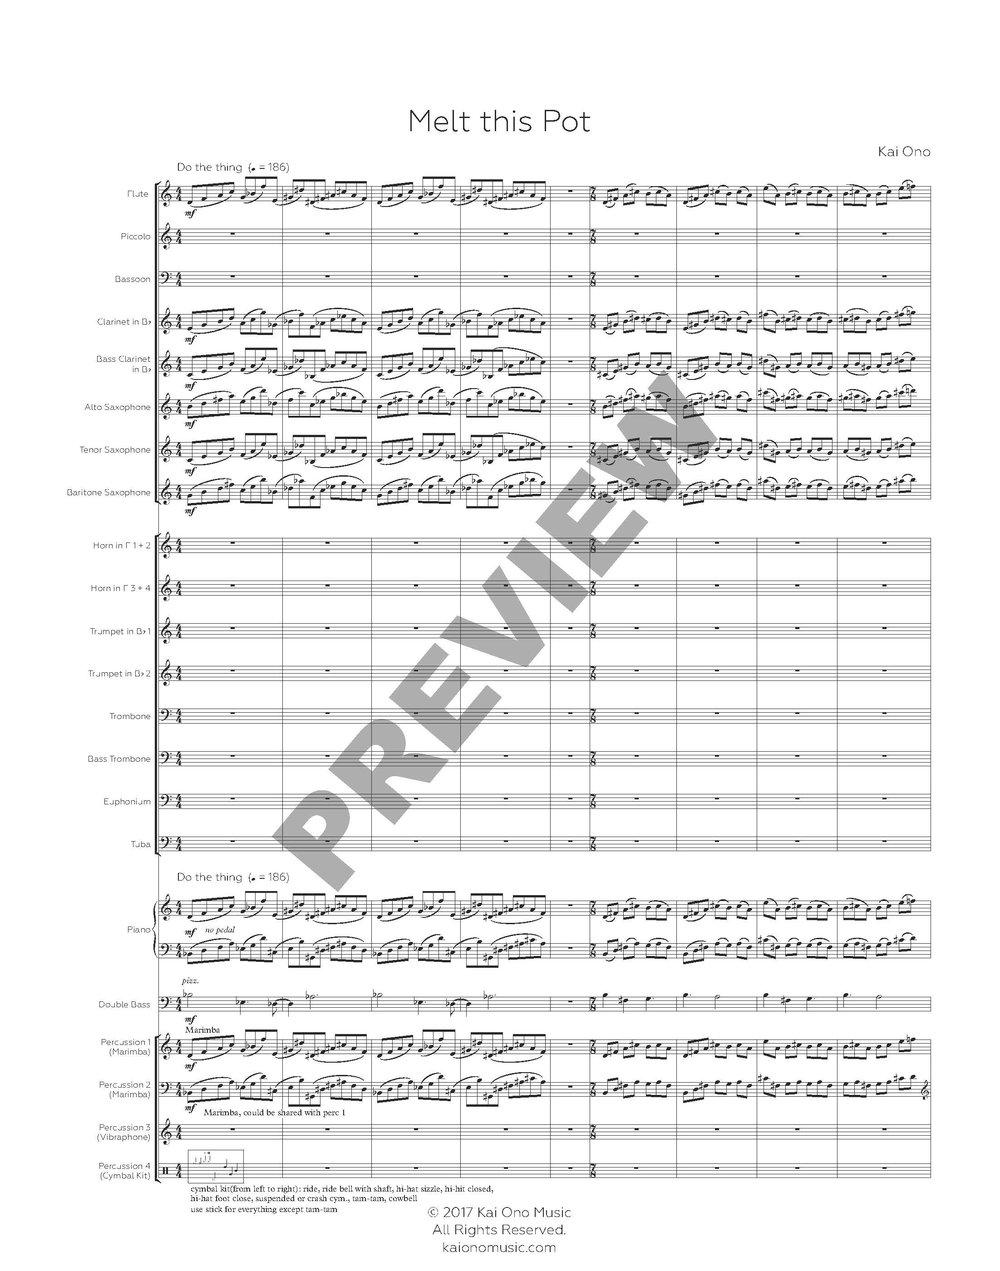 Melt this Pot - Full Score_Page_03.jpg